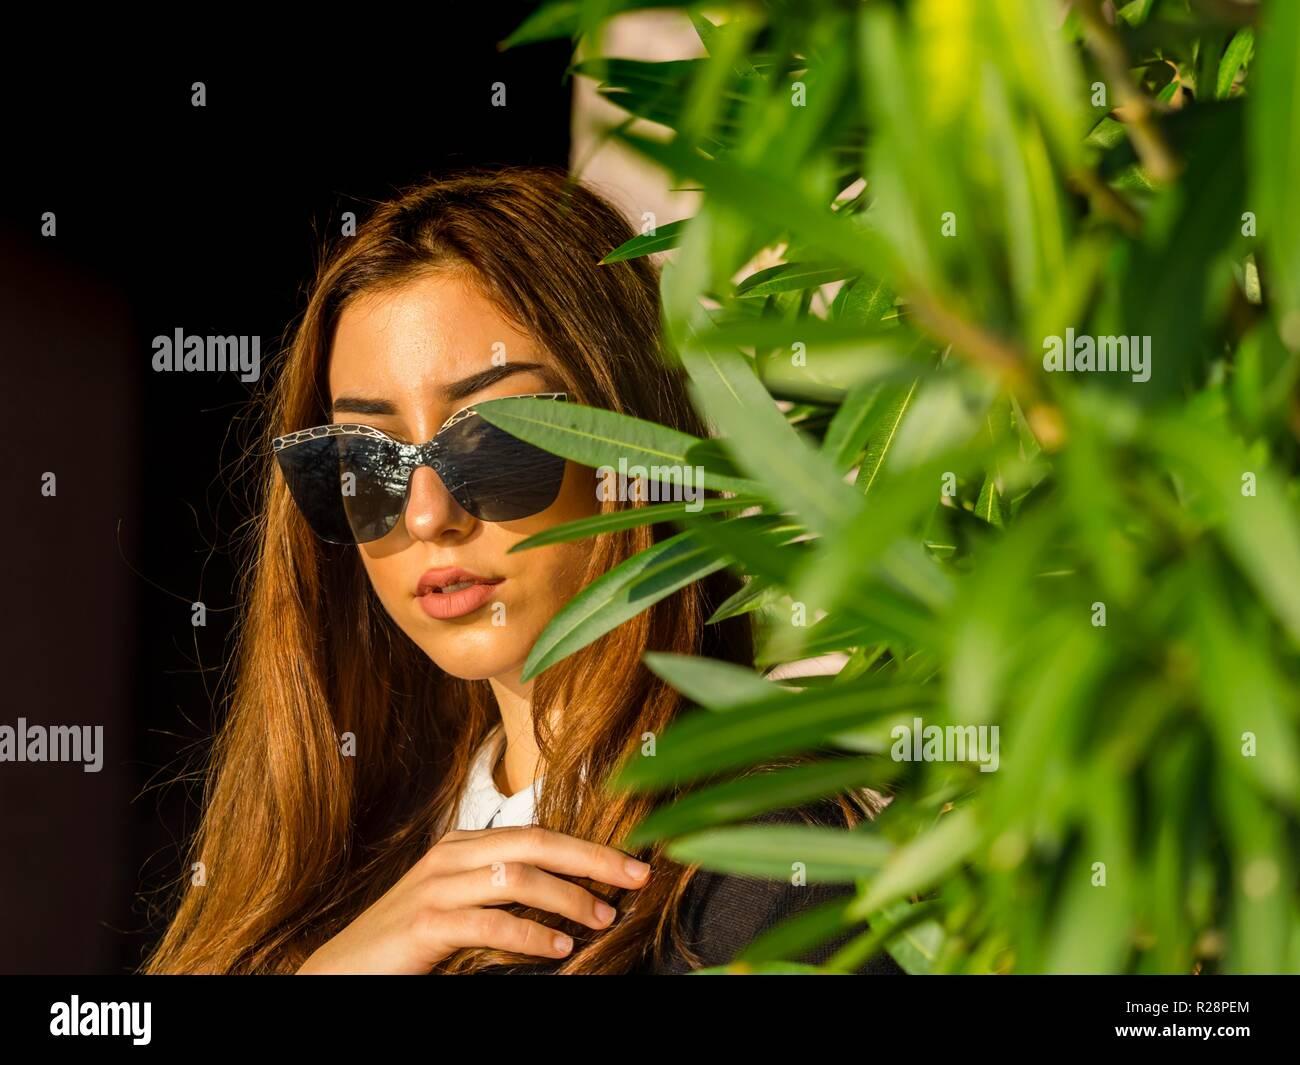 Teen girl hiding behind tree - Stock Image